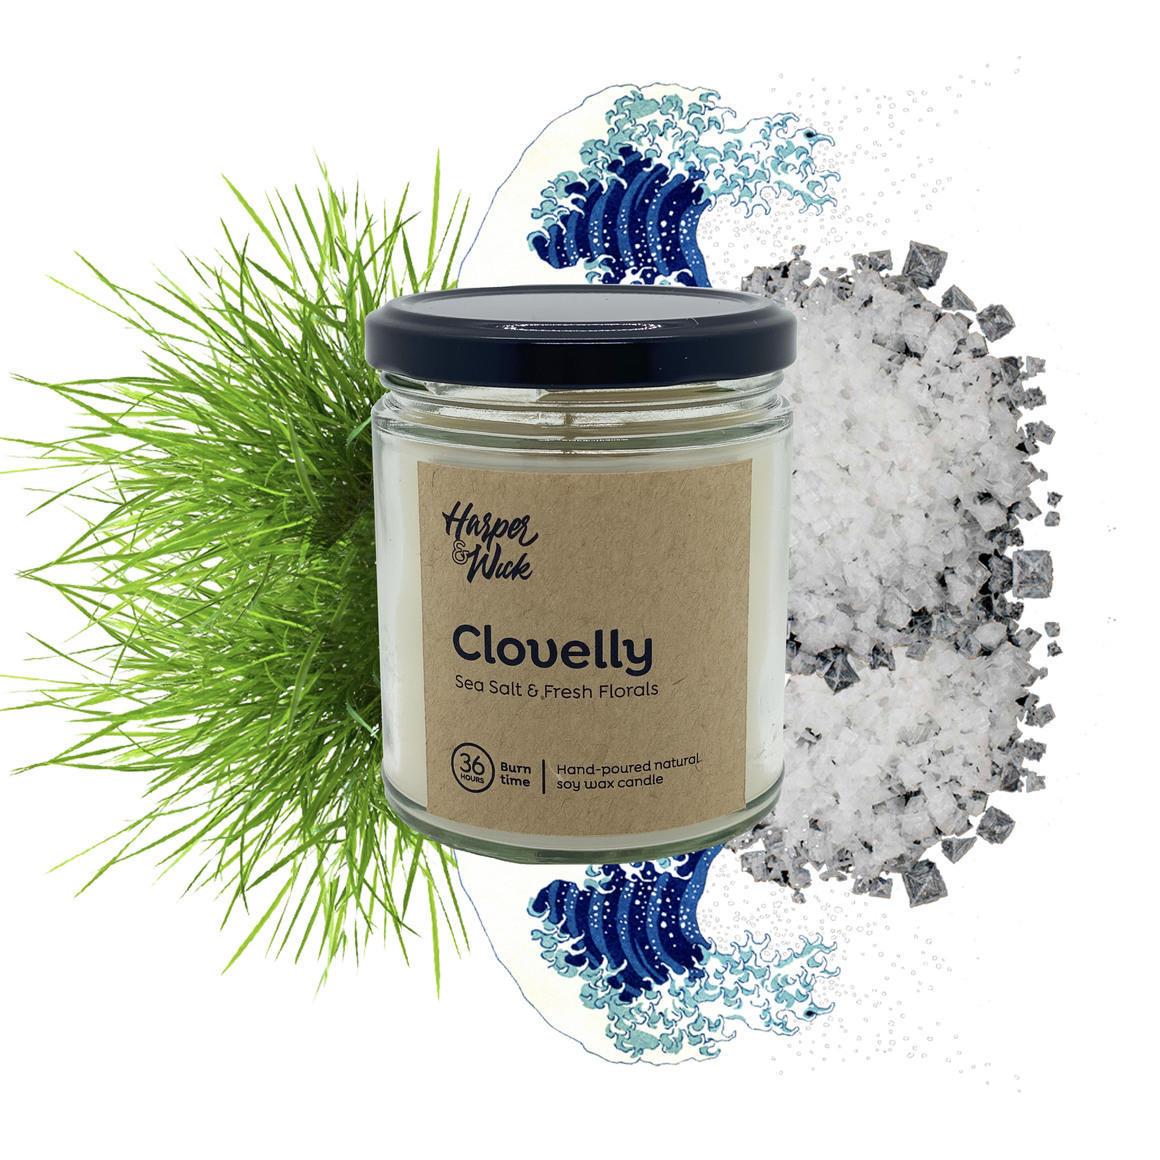 Clovelly - Sea Salt & Fresh Florals | Trada Marketplace